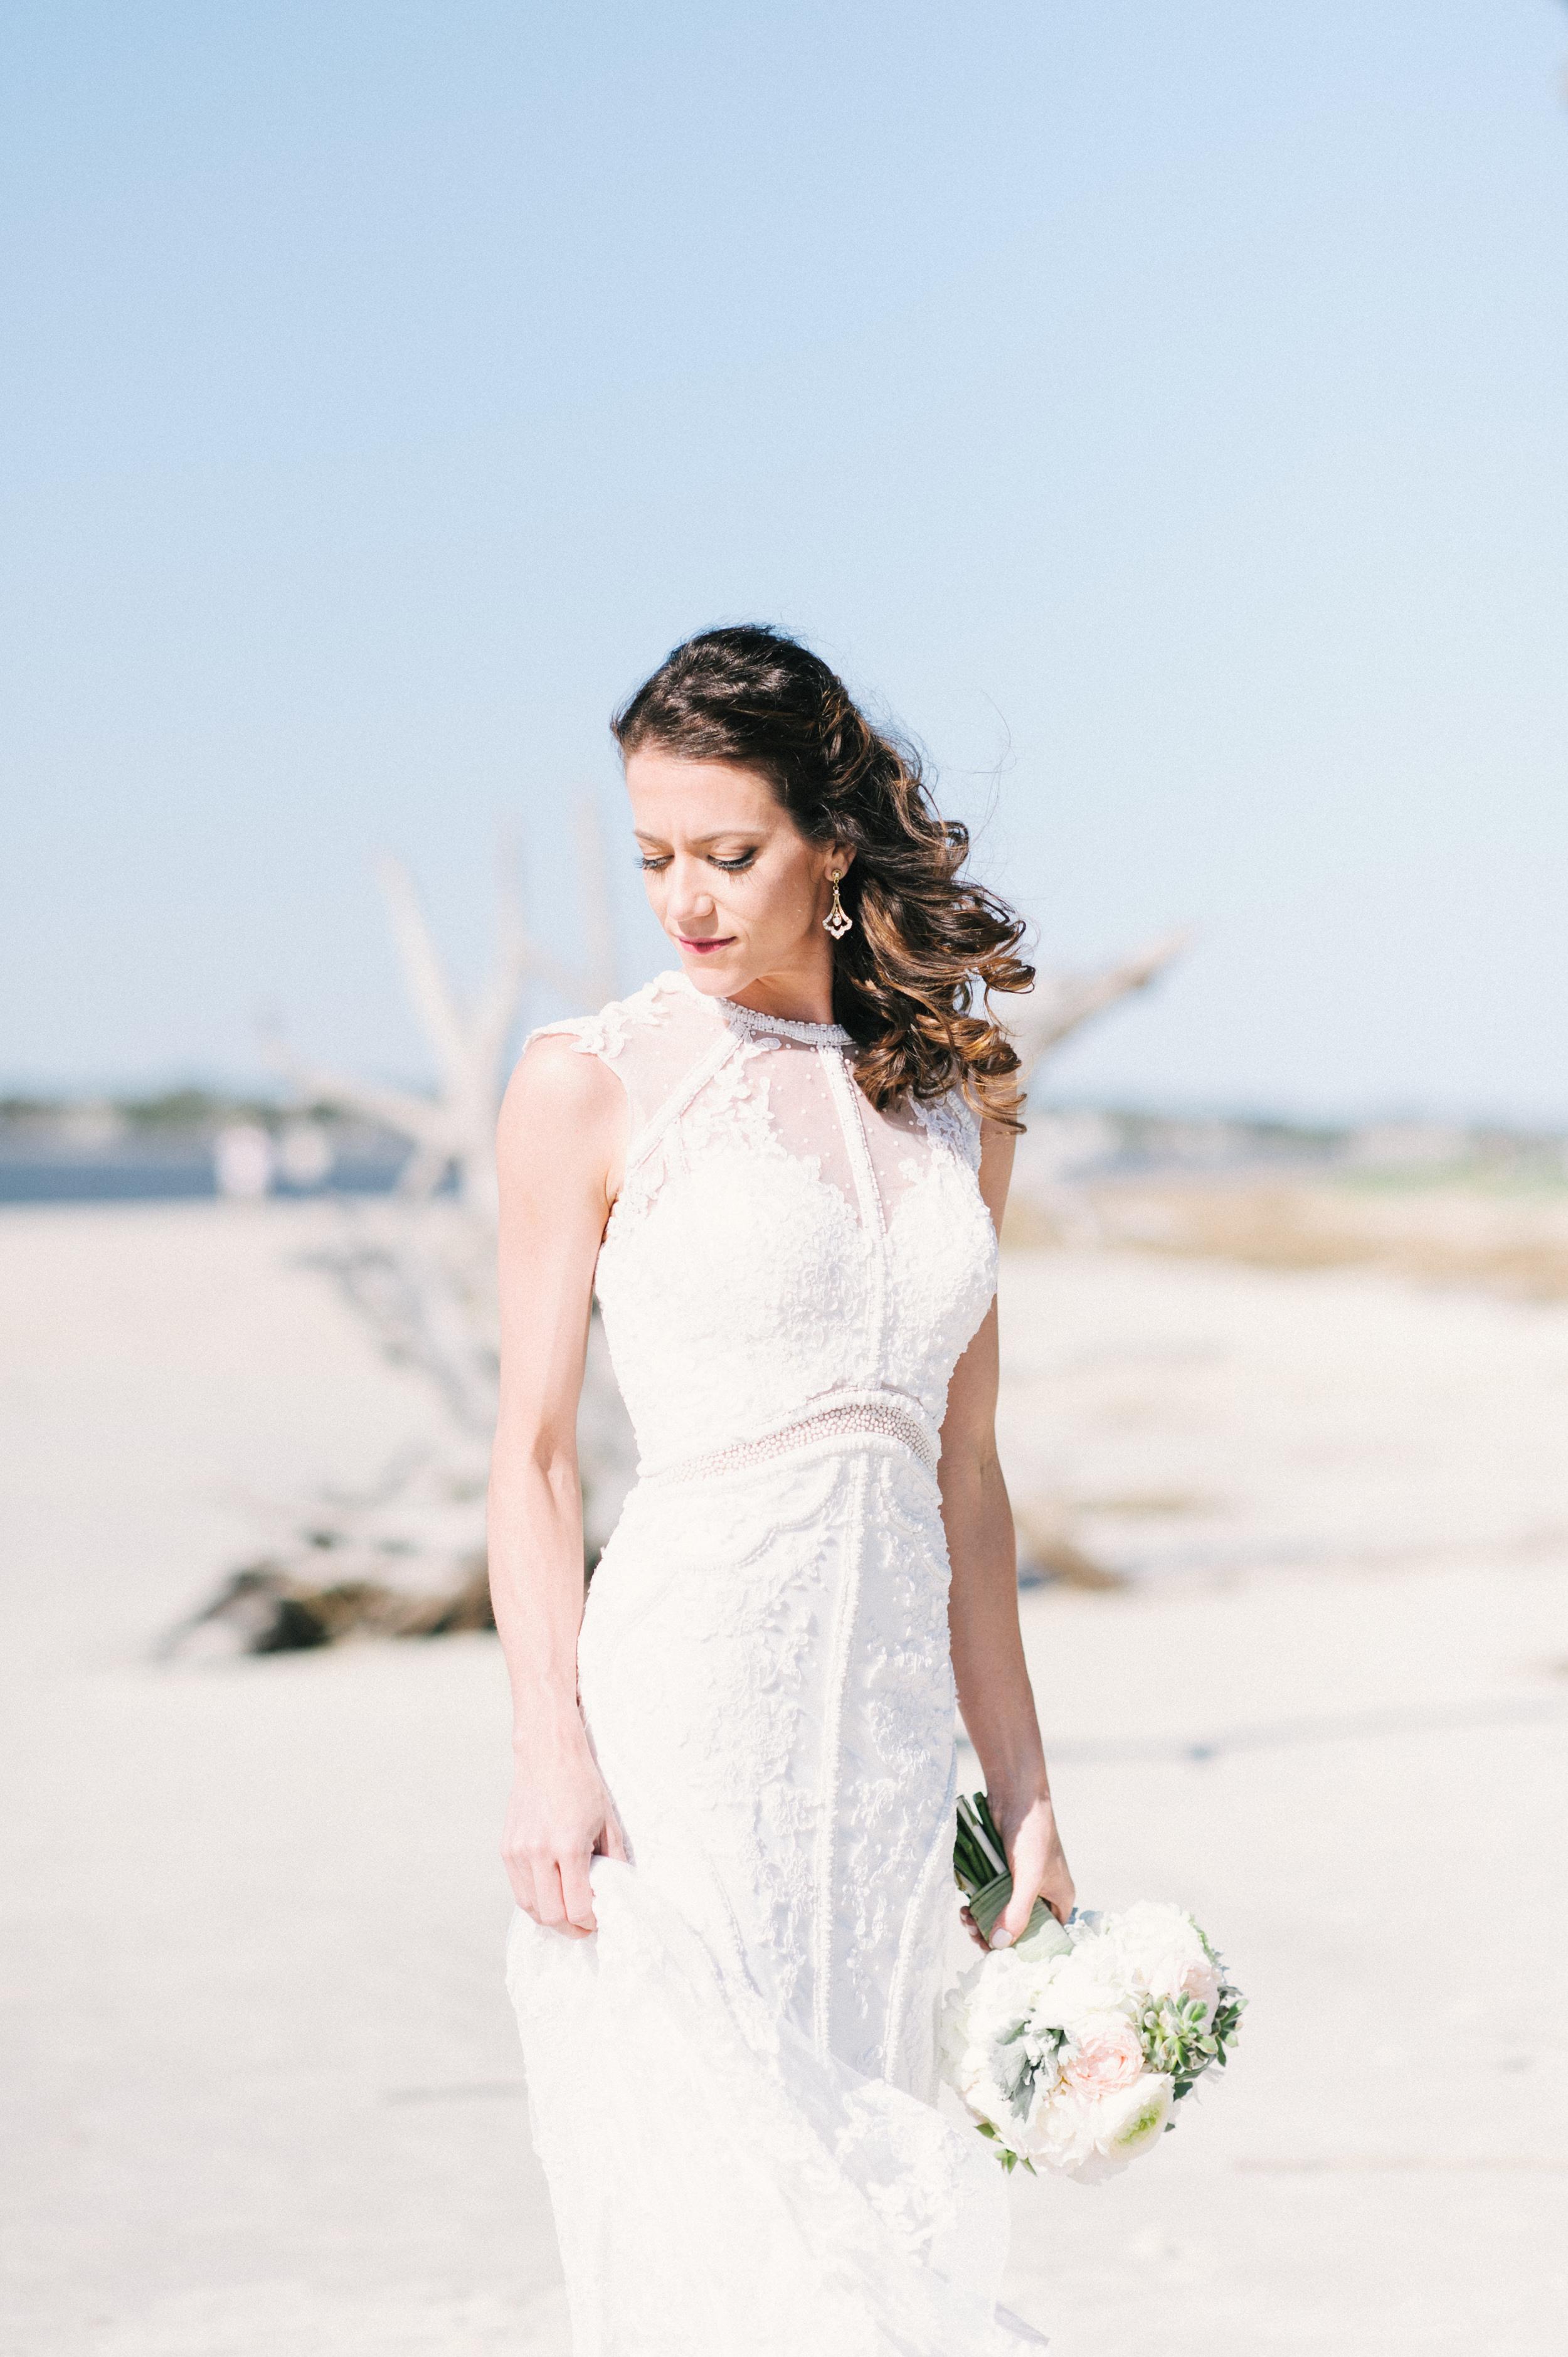 ajekyll-island-wedding-cocktails-and-details-savannah-georgia-wedding-photographer-jekyll-island-wedding-photographer-the-westin-jekyll-island-wedding-photographer-georgia-island-wedding-photographer